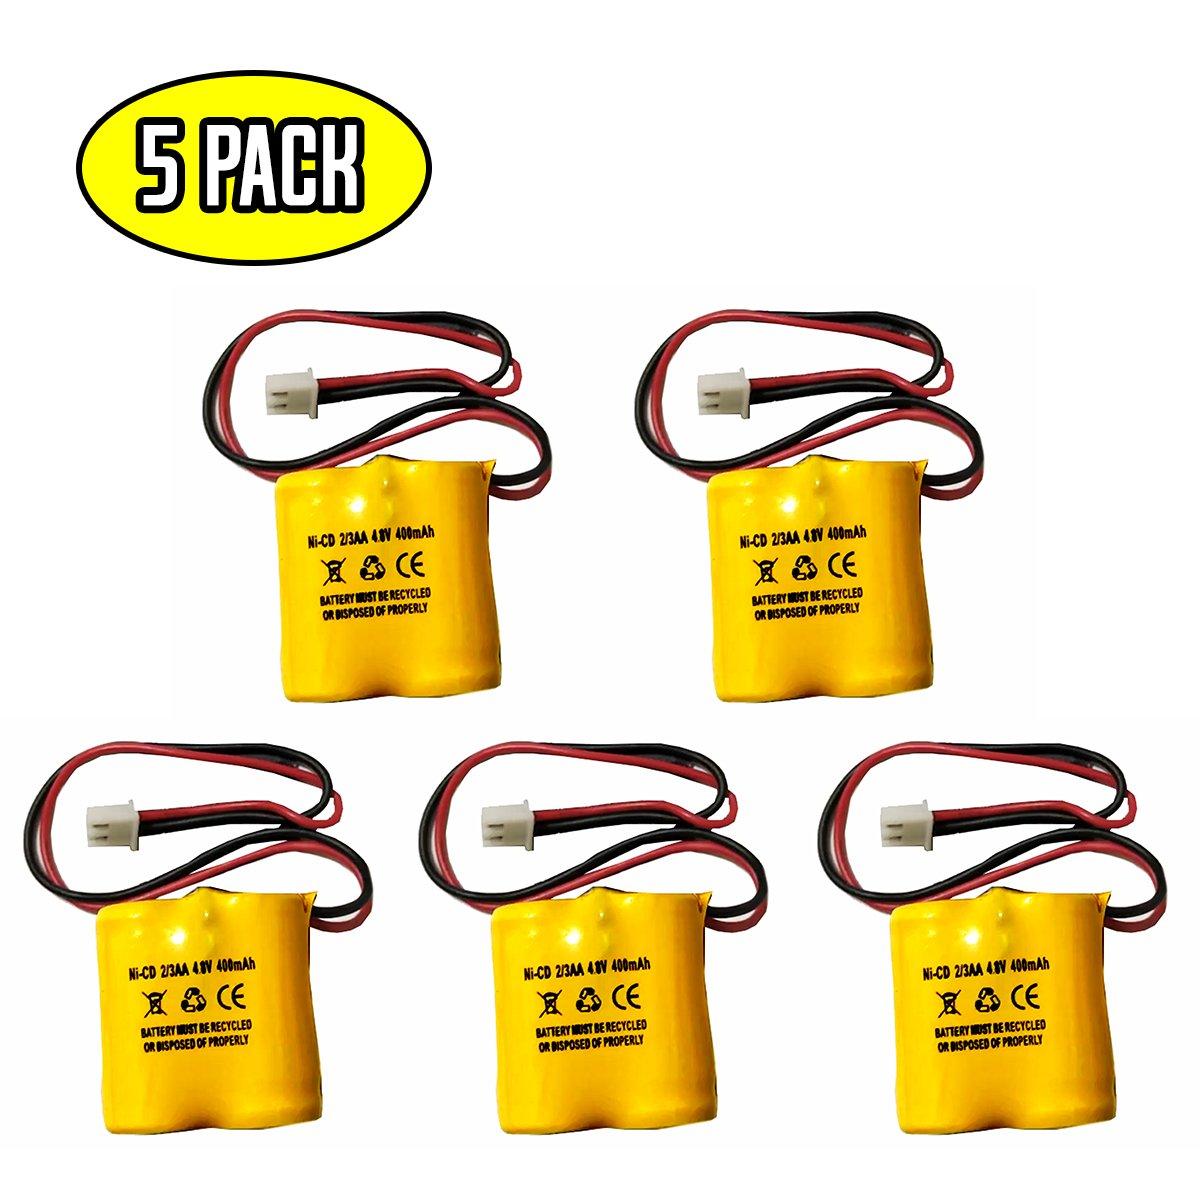 (5 pack) D-2/3AA400MAH BL93NC484 MK Power MH29673 CUSTOM-196 Dantona BST Battery 4.8V OSA162 ANIC1361 4.8v 400mAh Ni-Cd Battery Replacement for Exit Sign Emergency Light